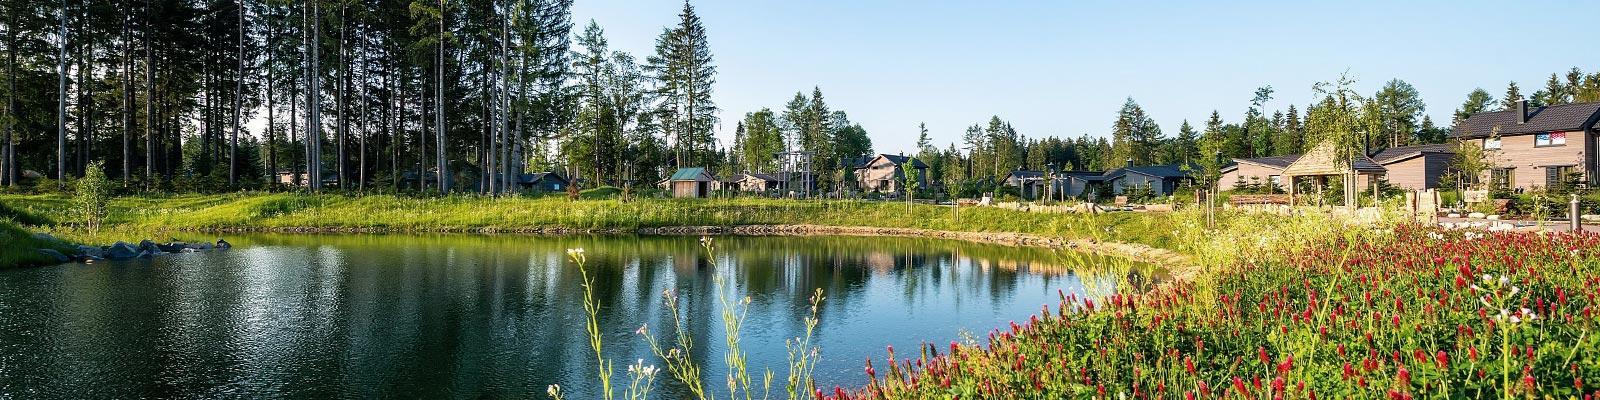 Vakantiepark in Leutkirch, Zuid-Duitsland